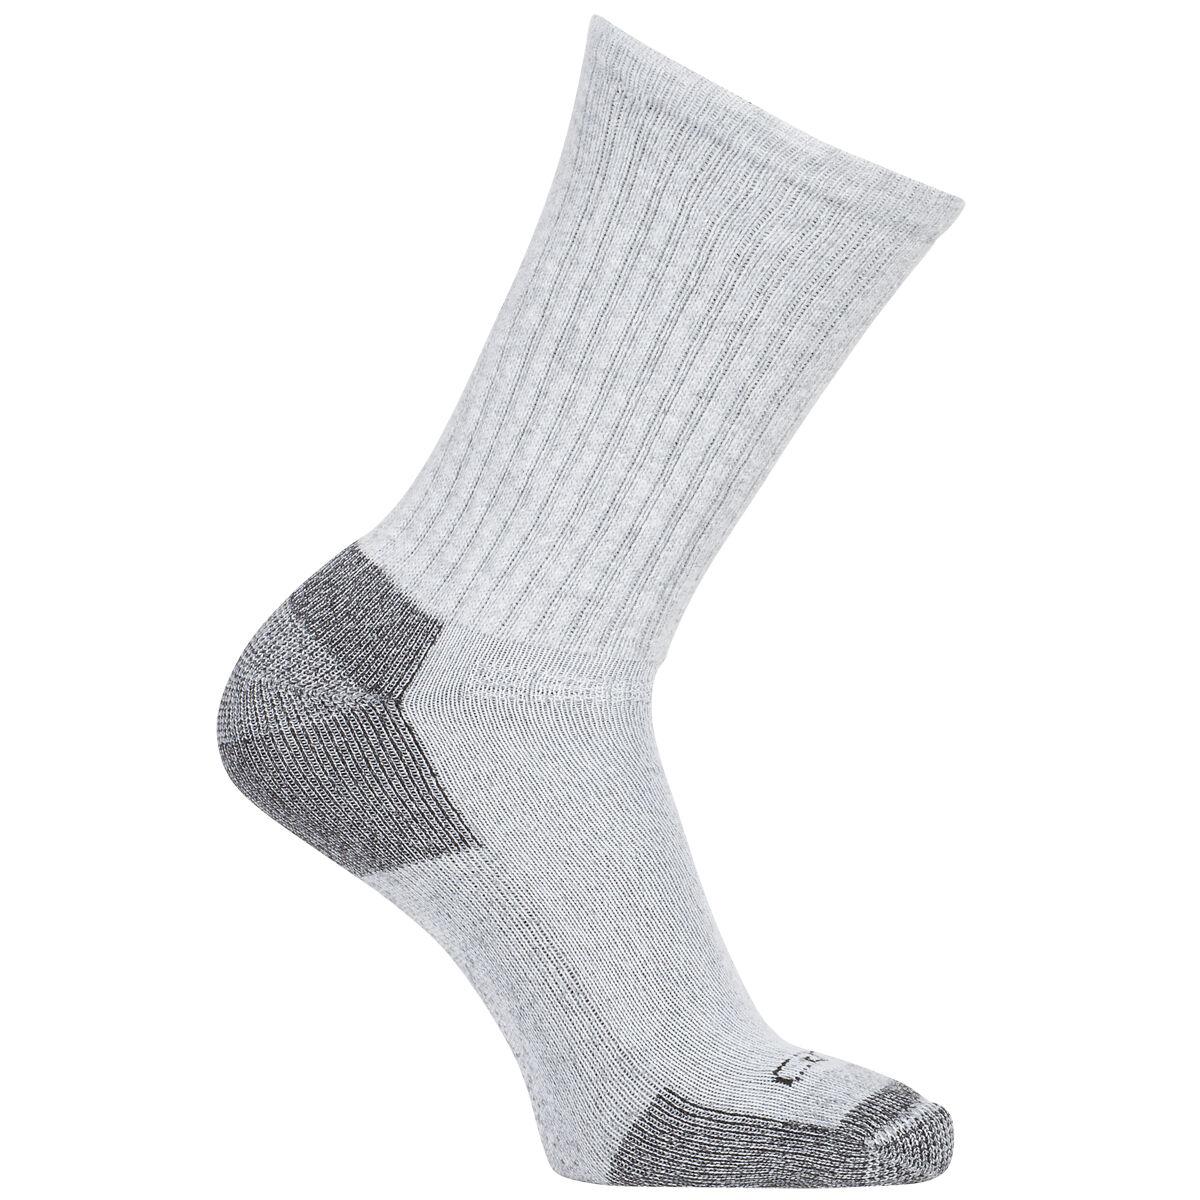 Carhartt Men's All Season Cotton Crew Sock - Black, L